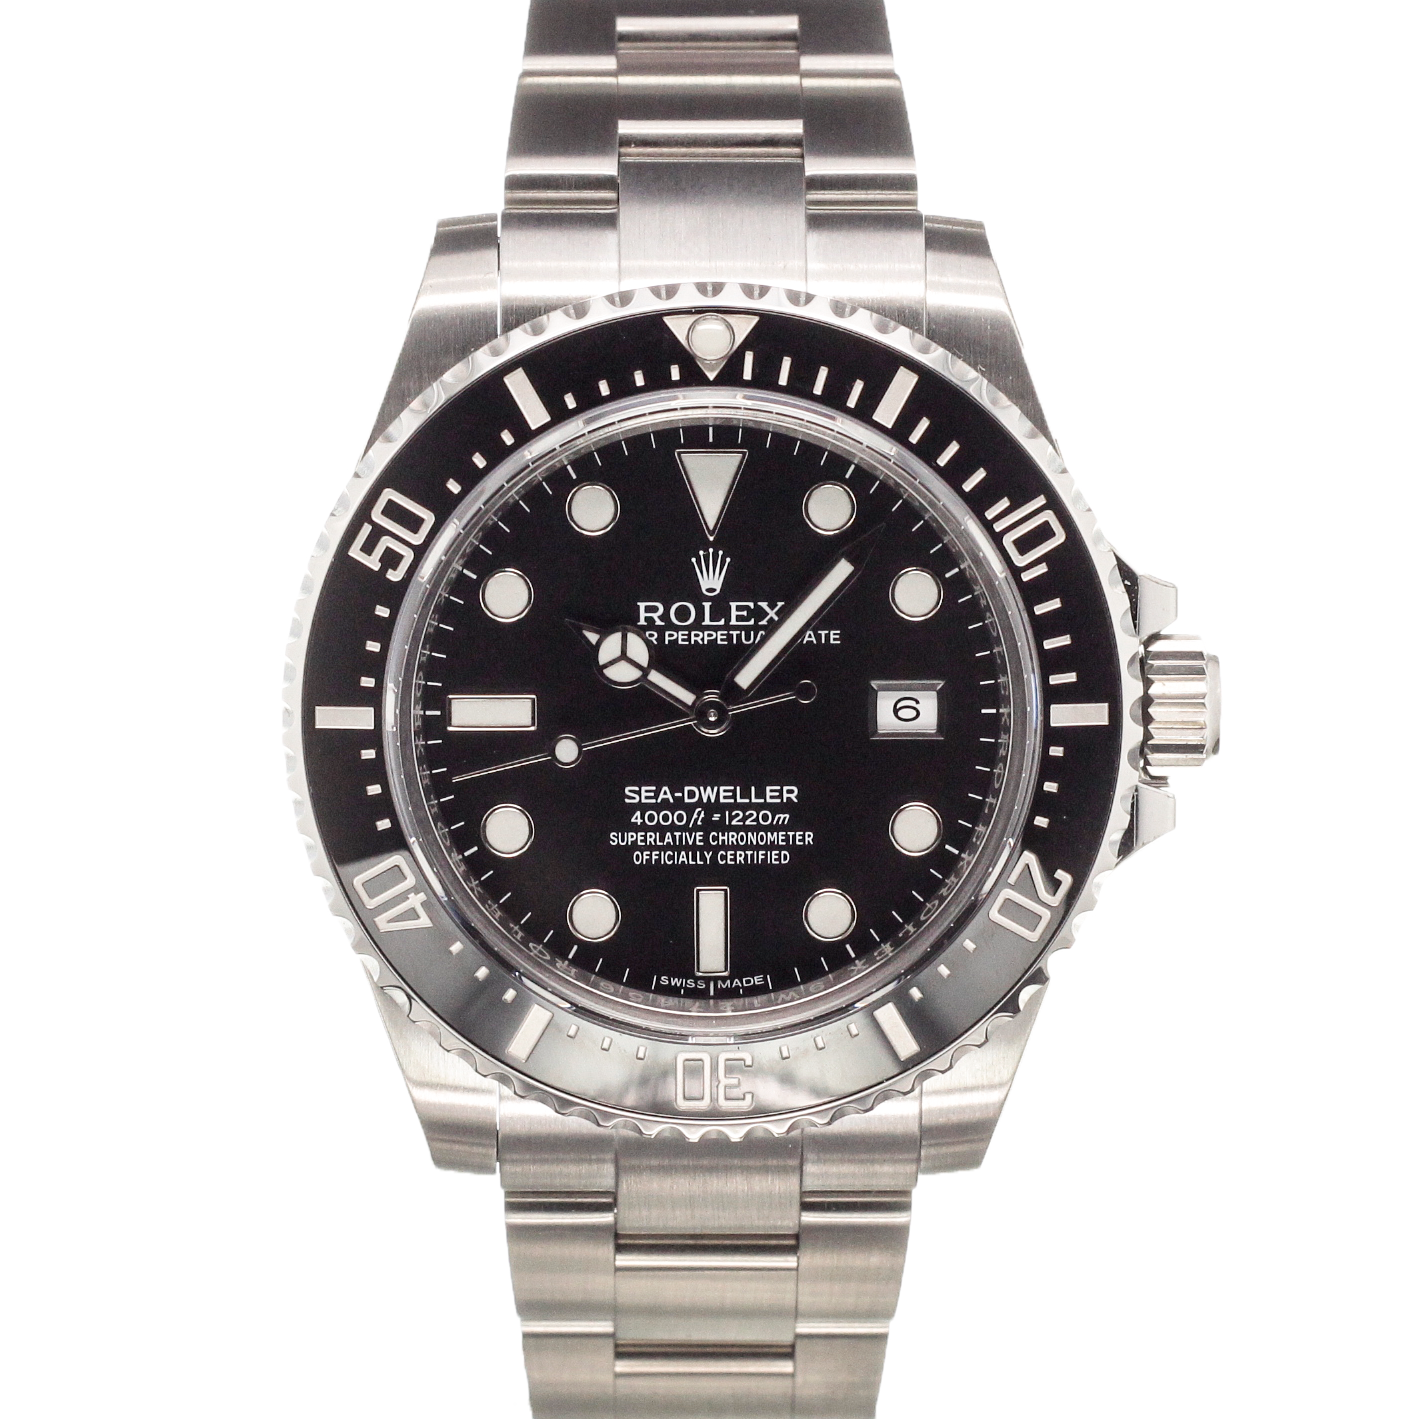 Rolex sea dweller infos price history chronext for Rolex sea wweller